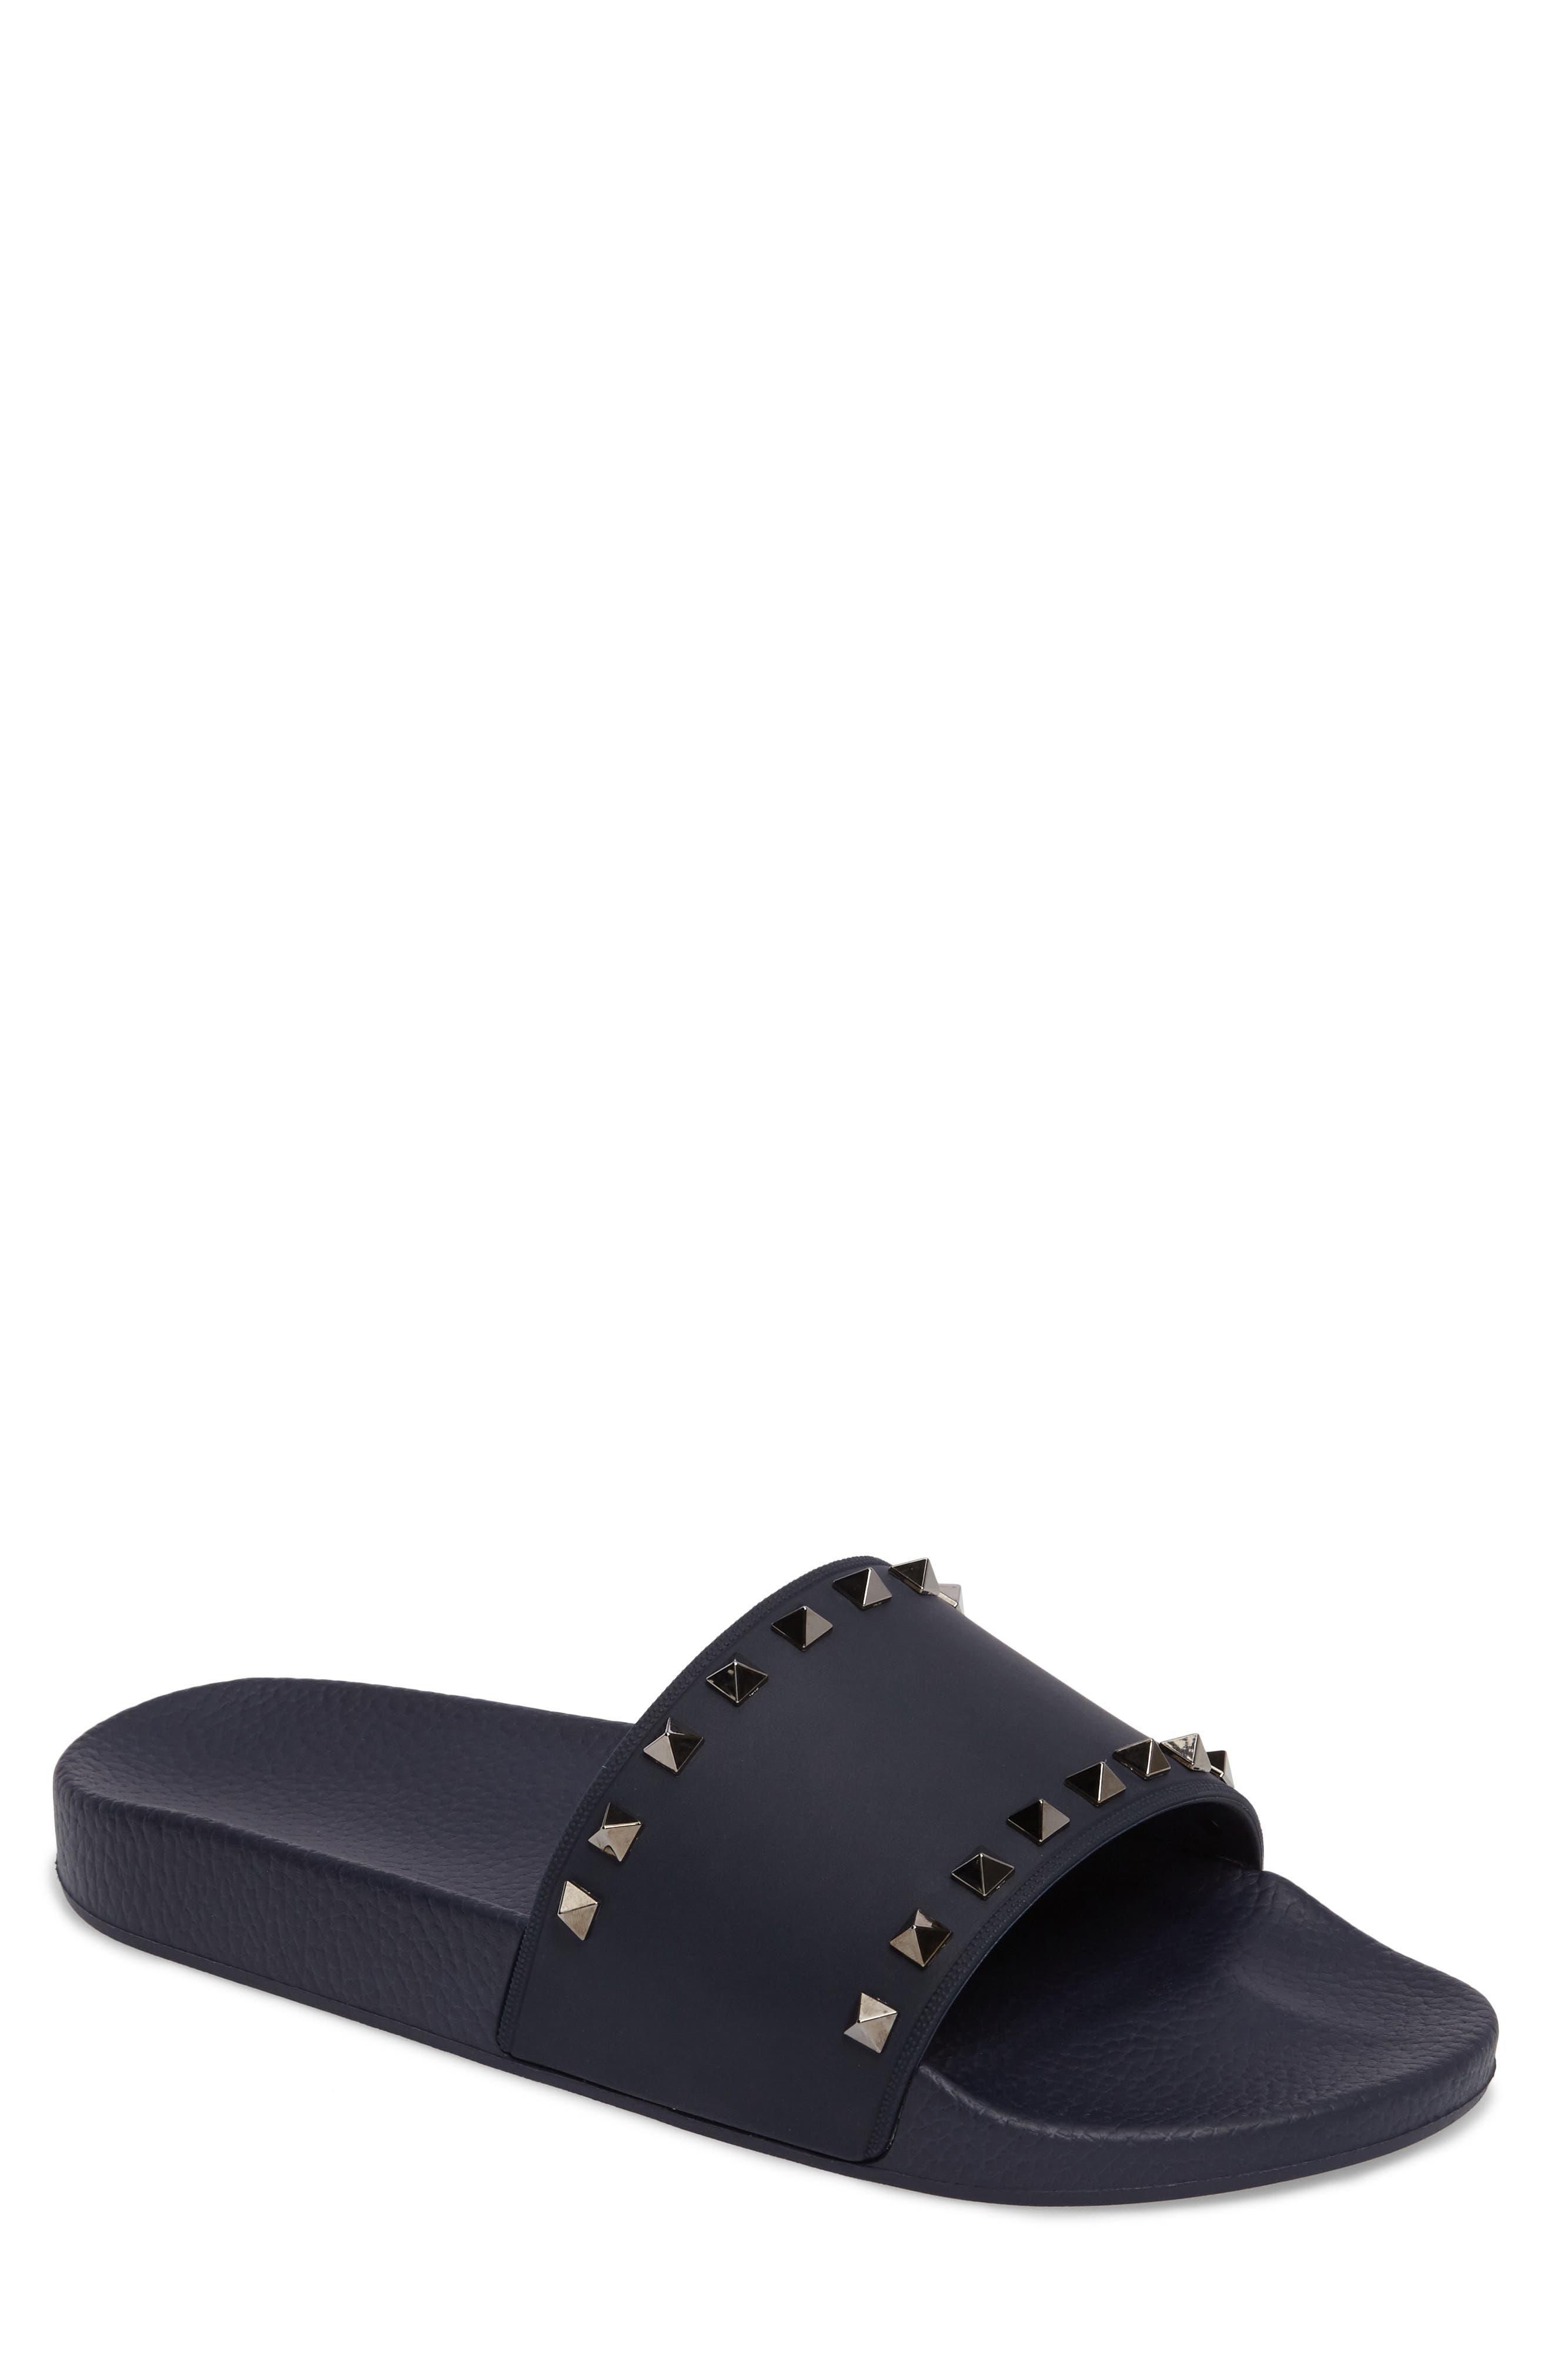 Rockstud Slide Sandal,                             Main thumbnail 1, color,                             Marine Blue